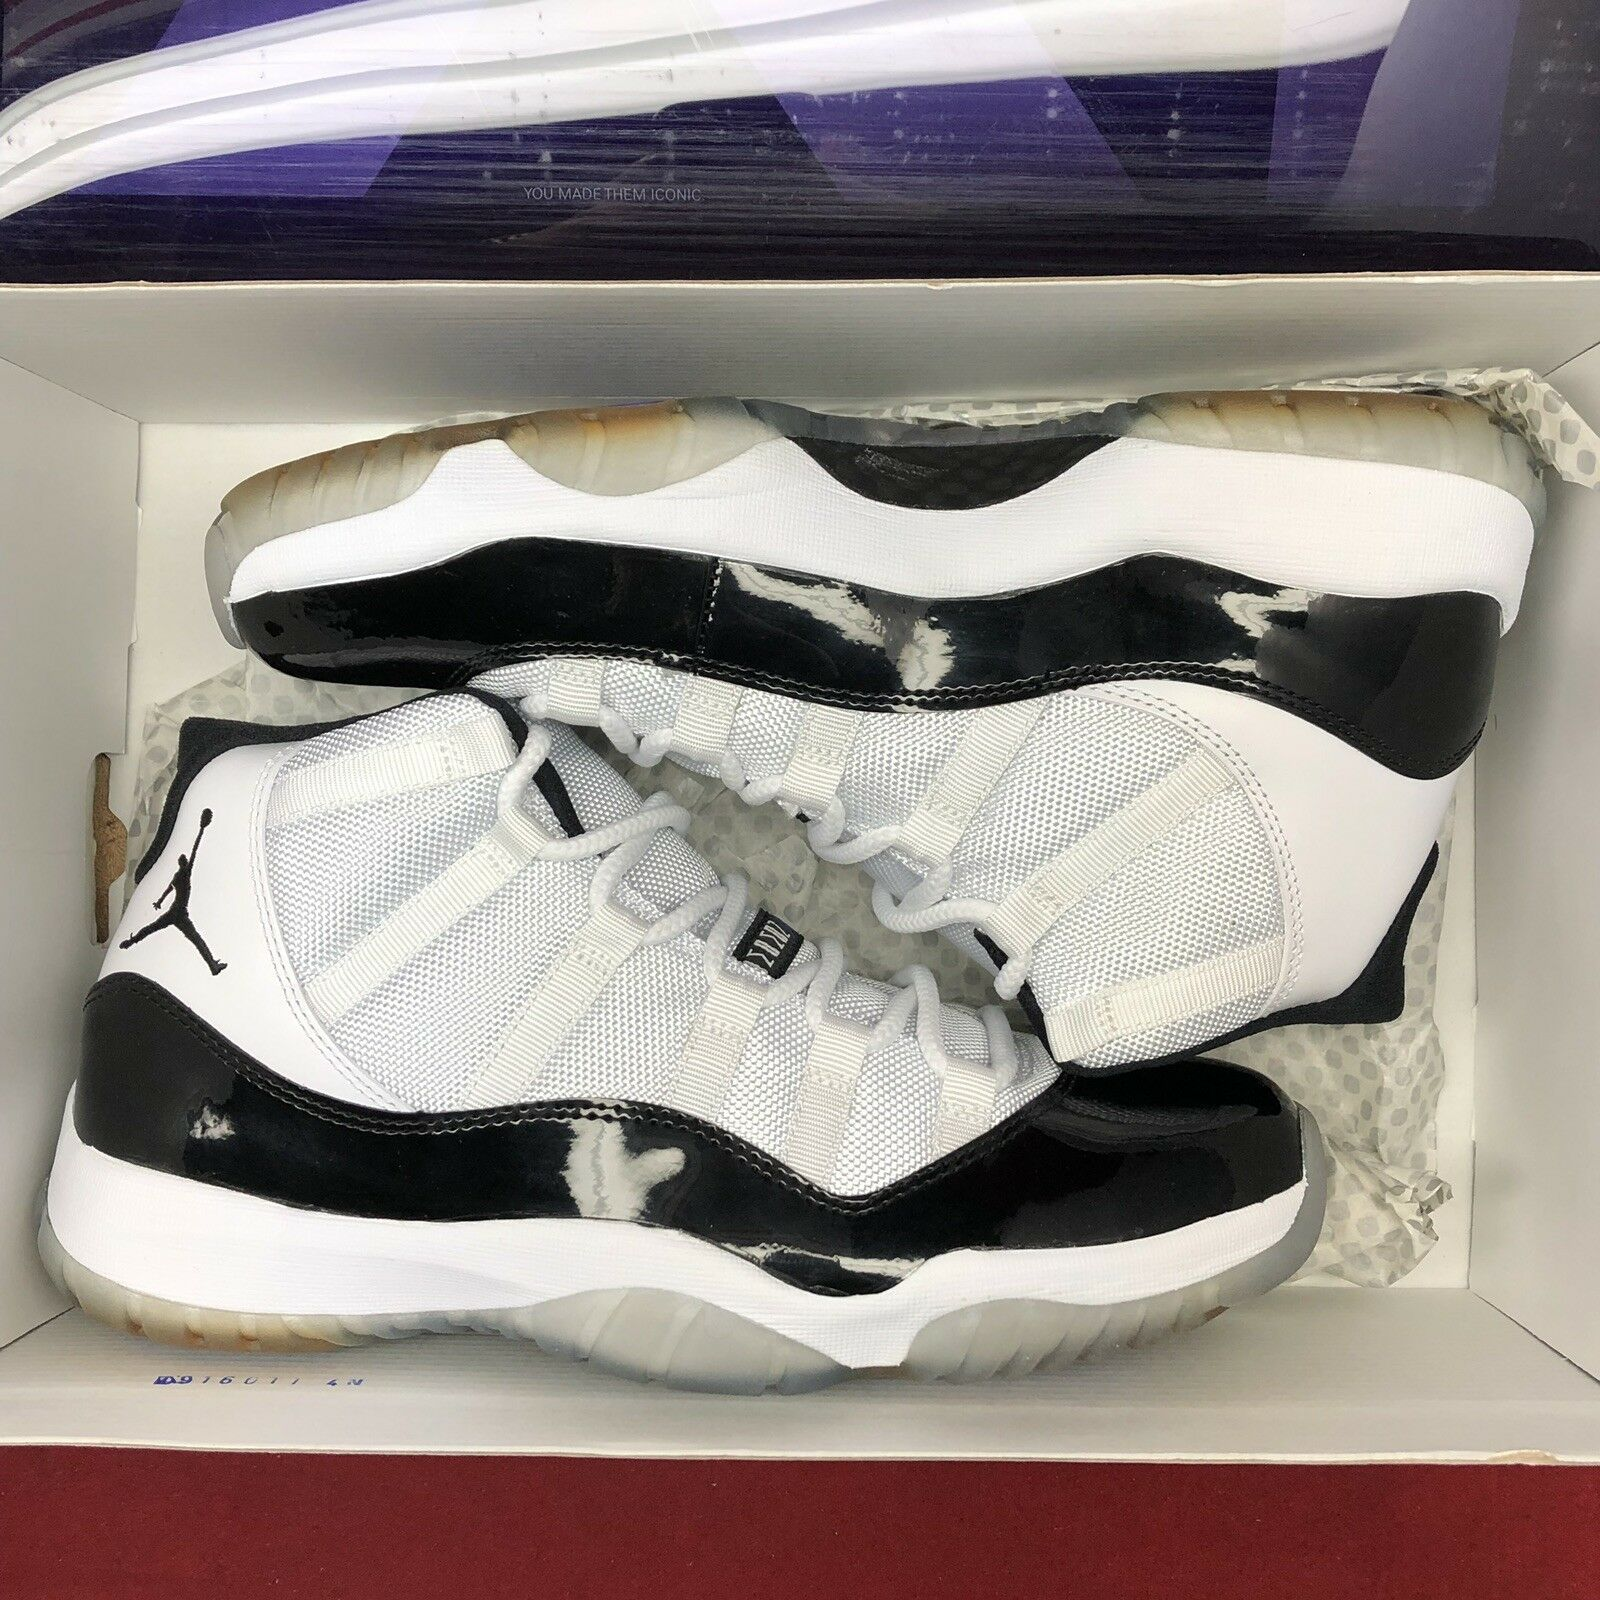 f4ff8685219 Nike Air Jordan Retro XI Concord Black White 378037 107 SZ 10.5 Space Jam  72-